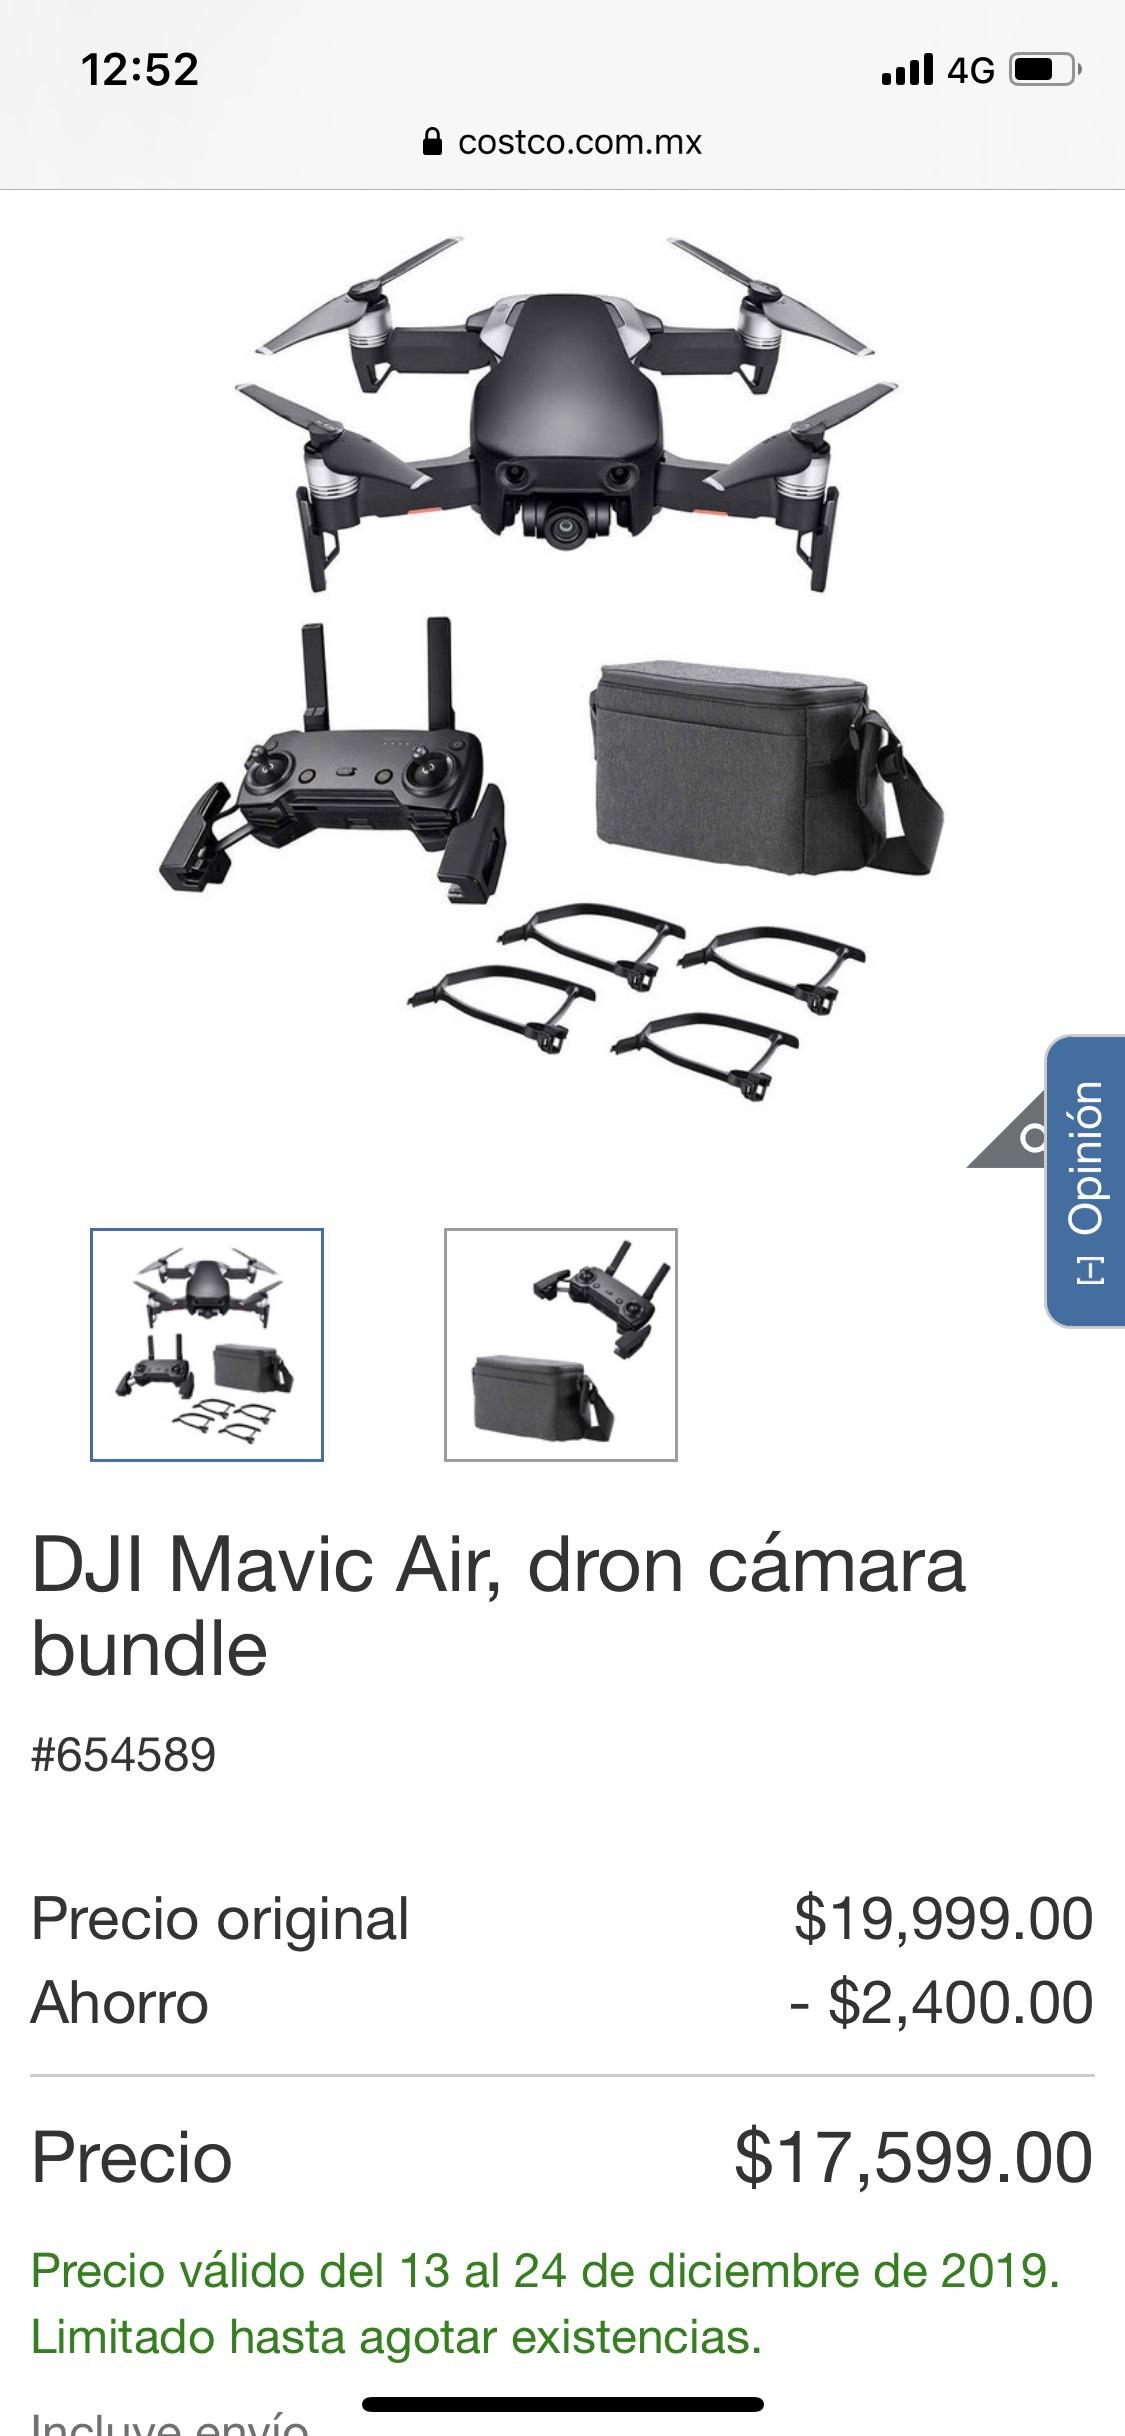 Costco: DJI Mavic Air, dron cámara bundle